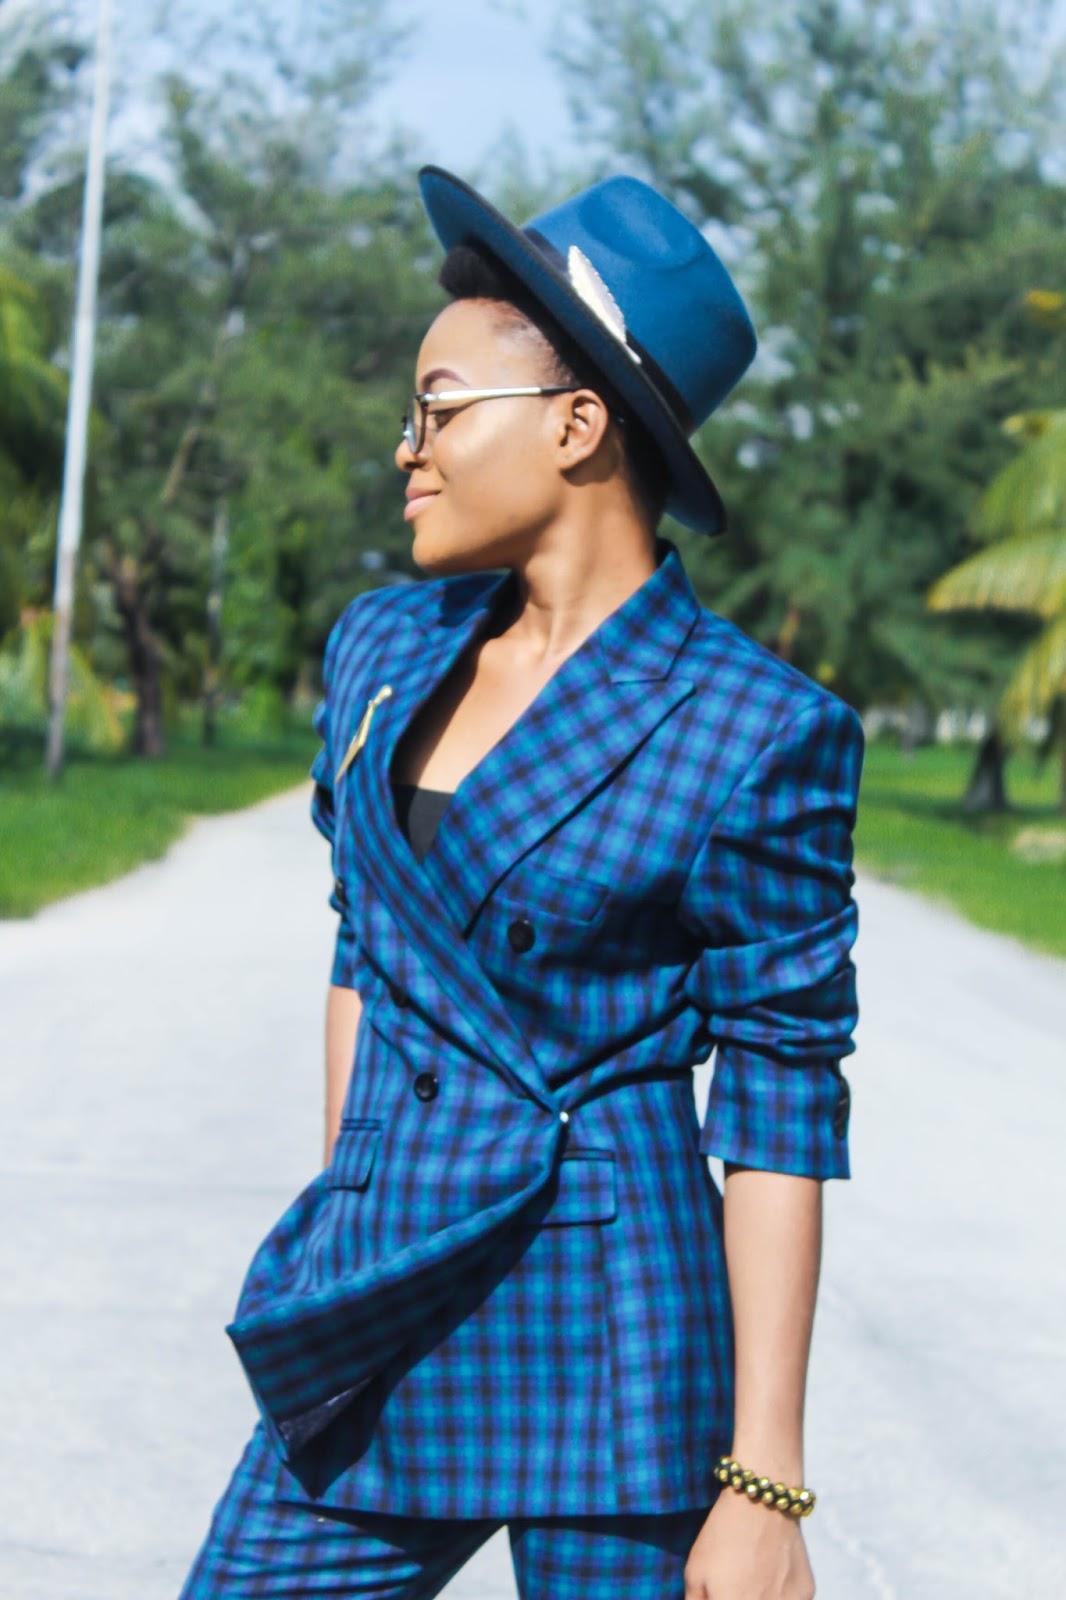 tomboy style blog, androgynous fashion, teal blue fedora hat